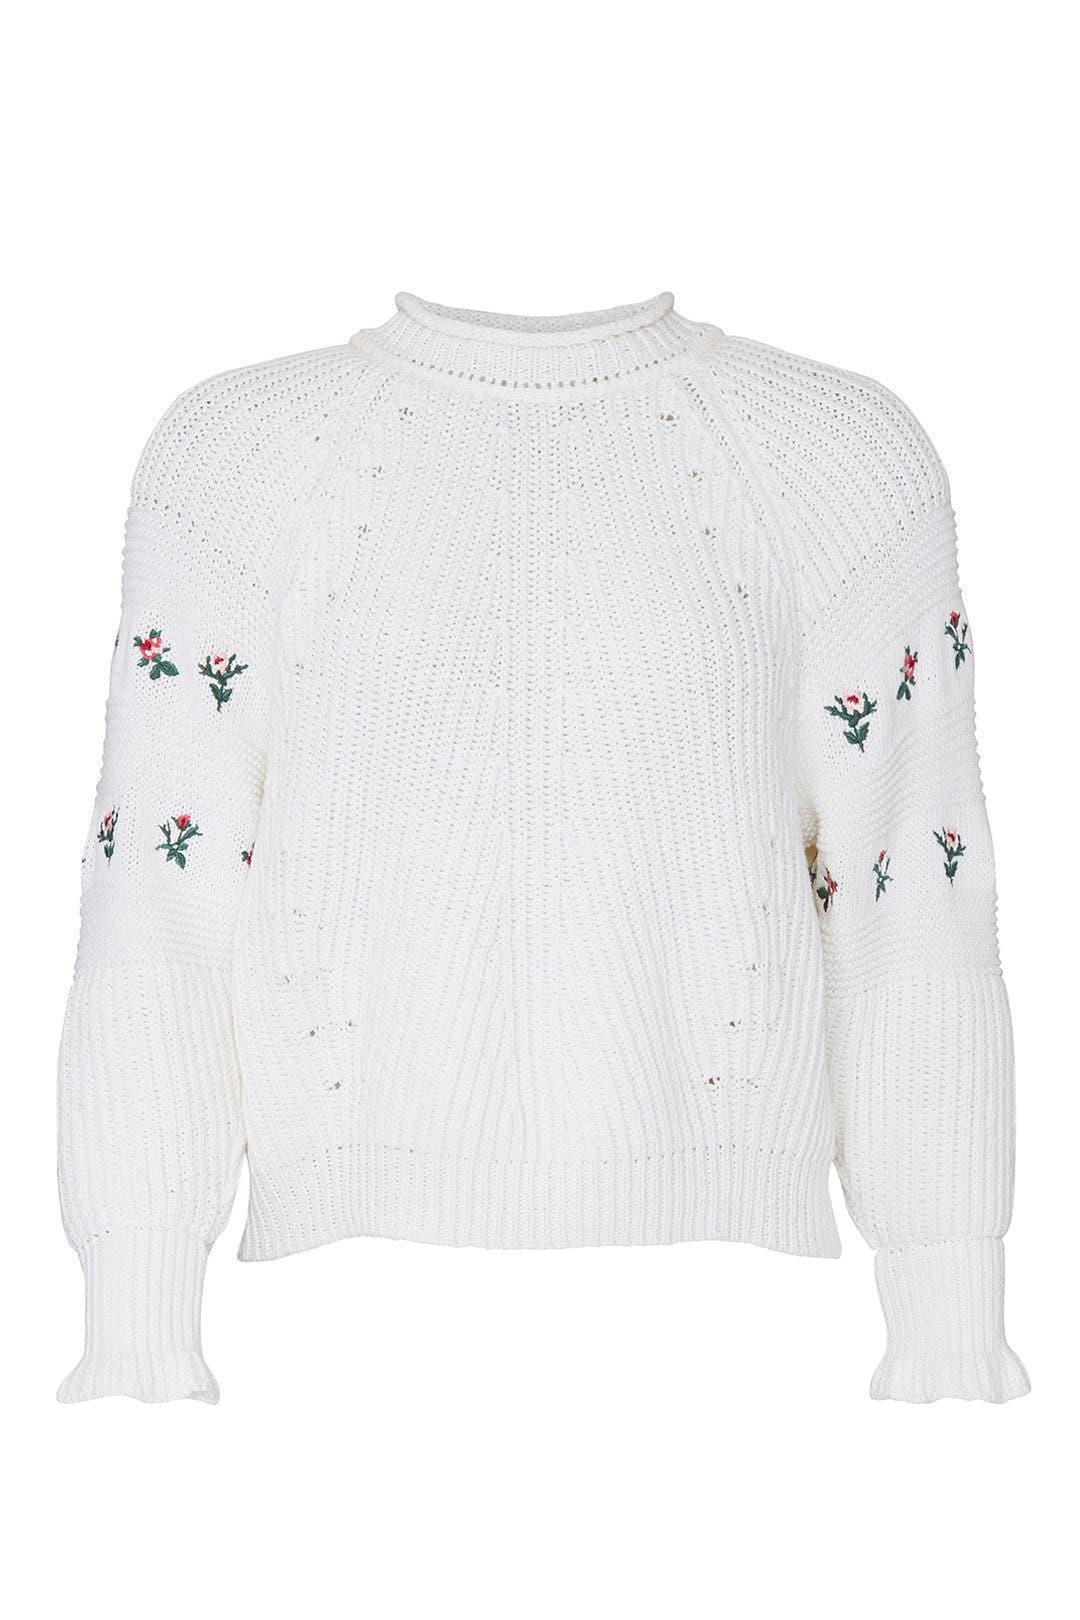 Philosophy di Lorenzo Serafini Knit Embroidered Sweater